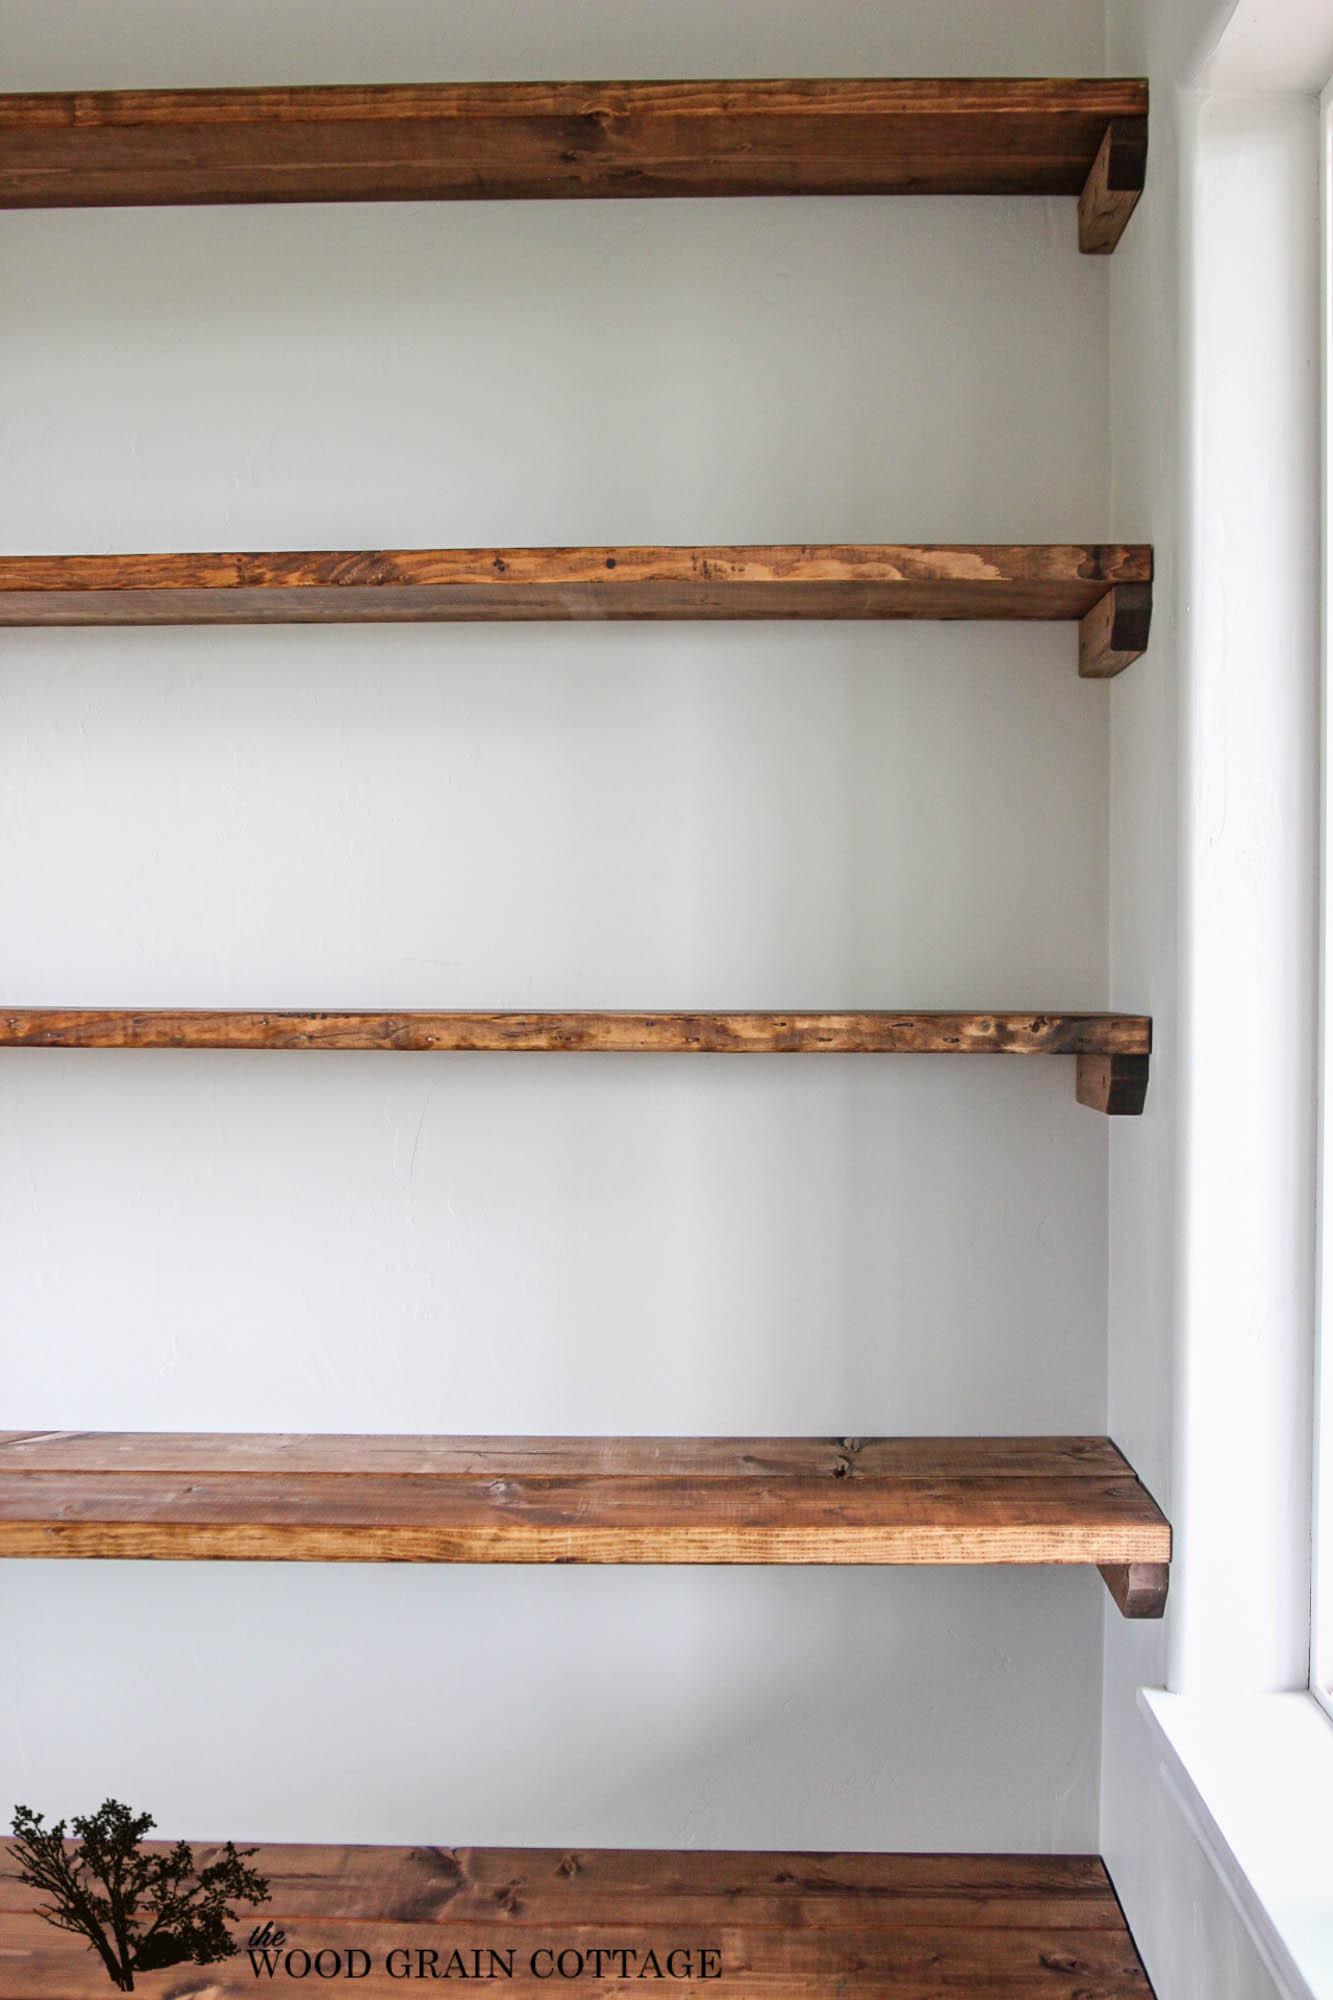 DIY Wood Shelf  DIY Dining Room Open Shelving The Wood Grain Cottage